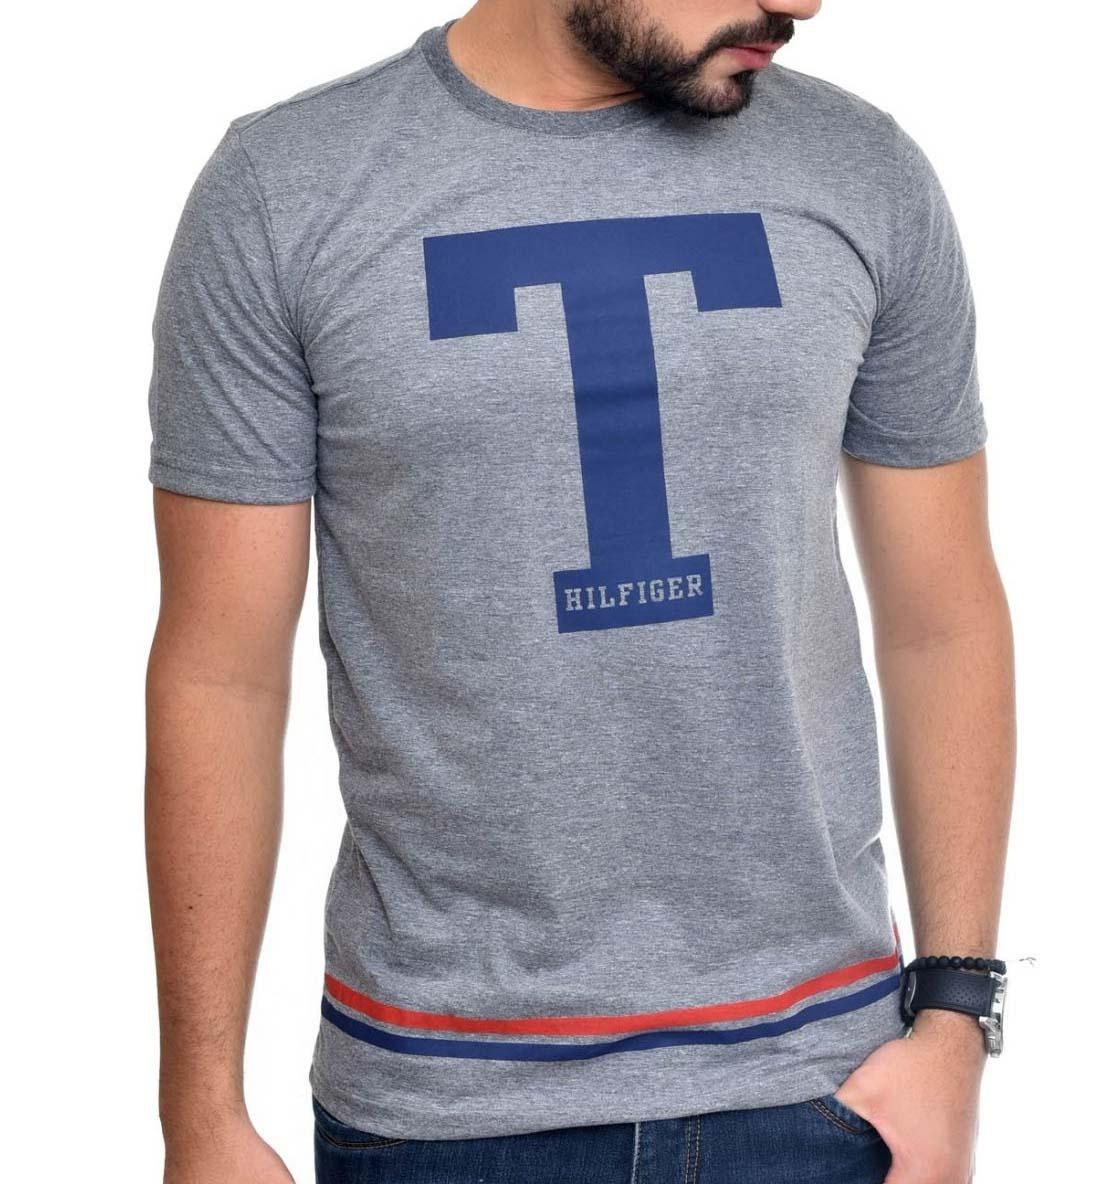 camiseta tommy hilfiger mescla escuro. Carregando zoom. ca57ac85ddded